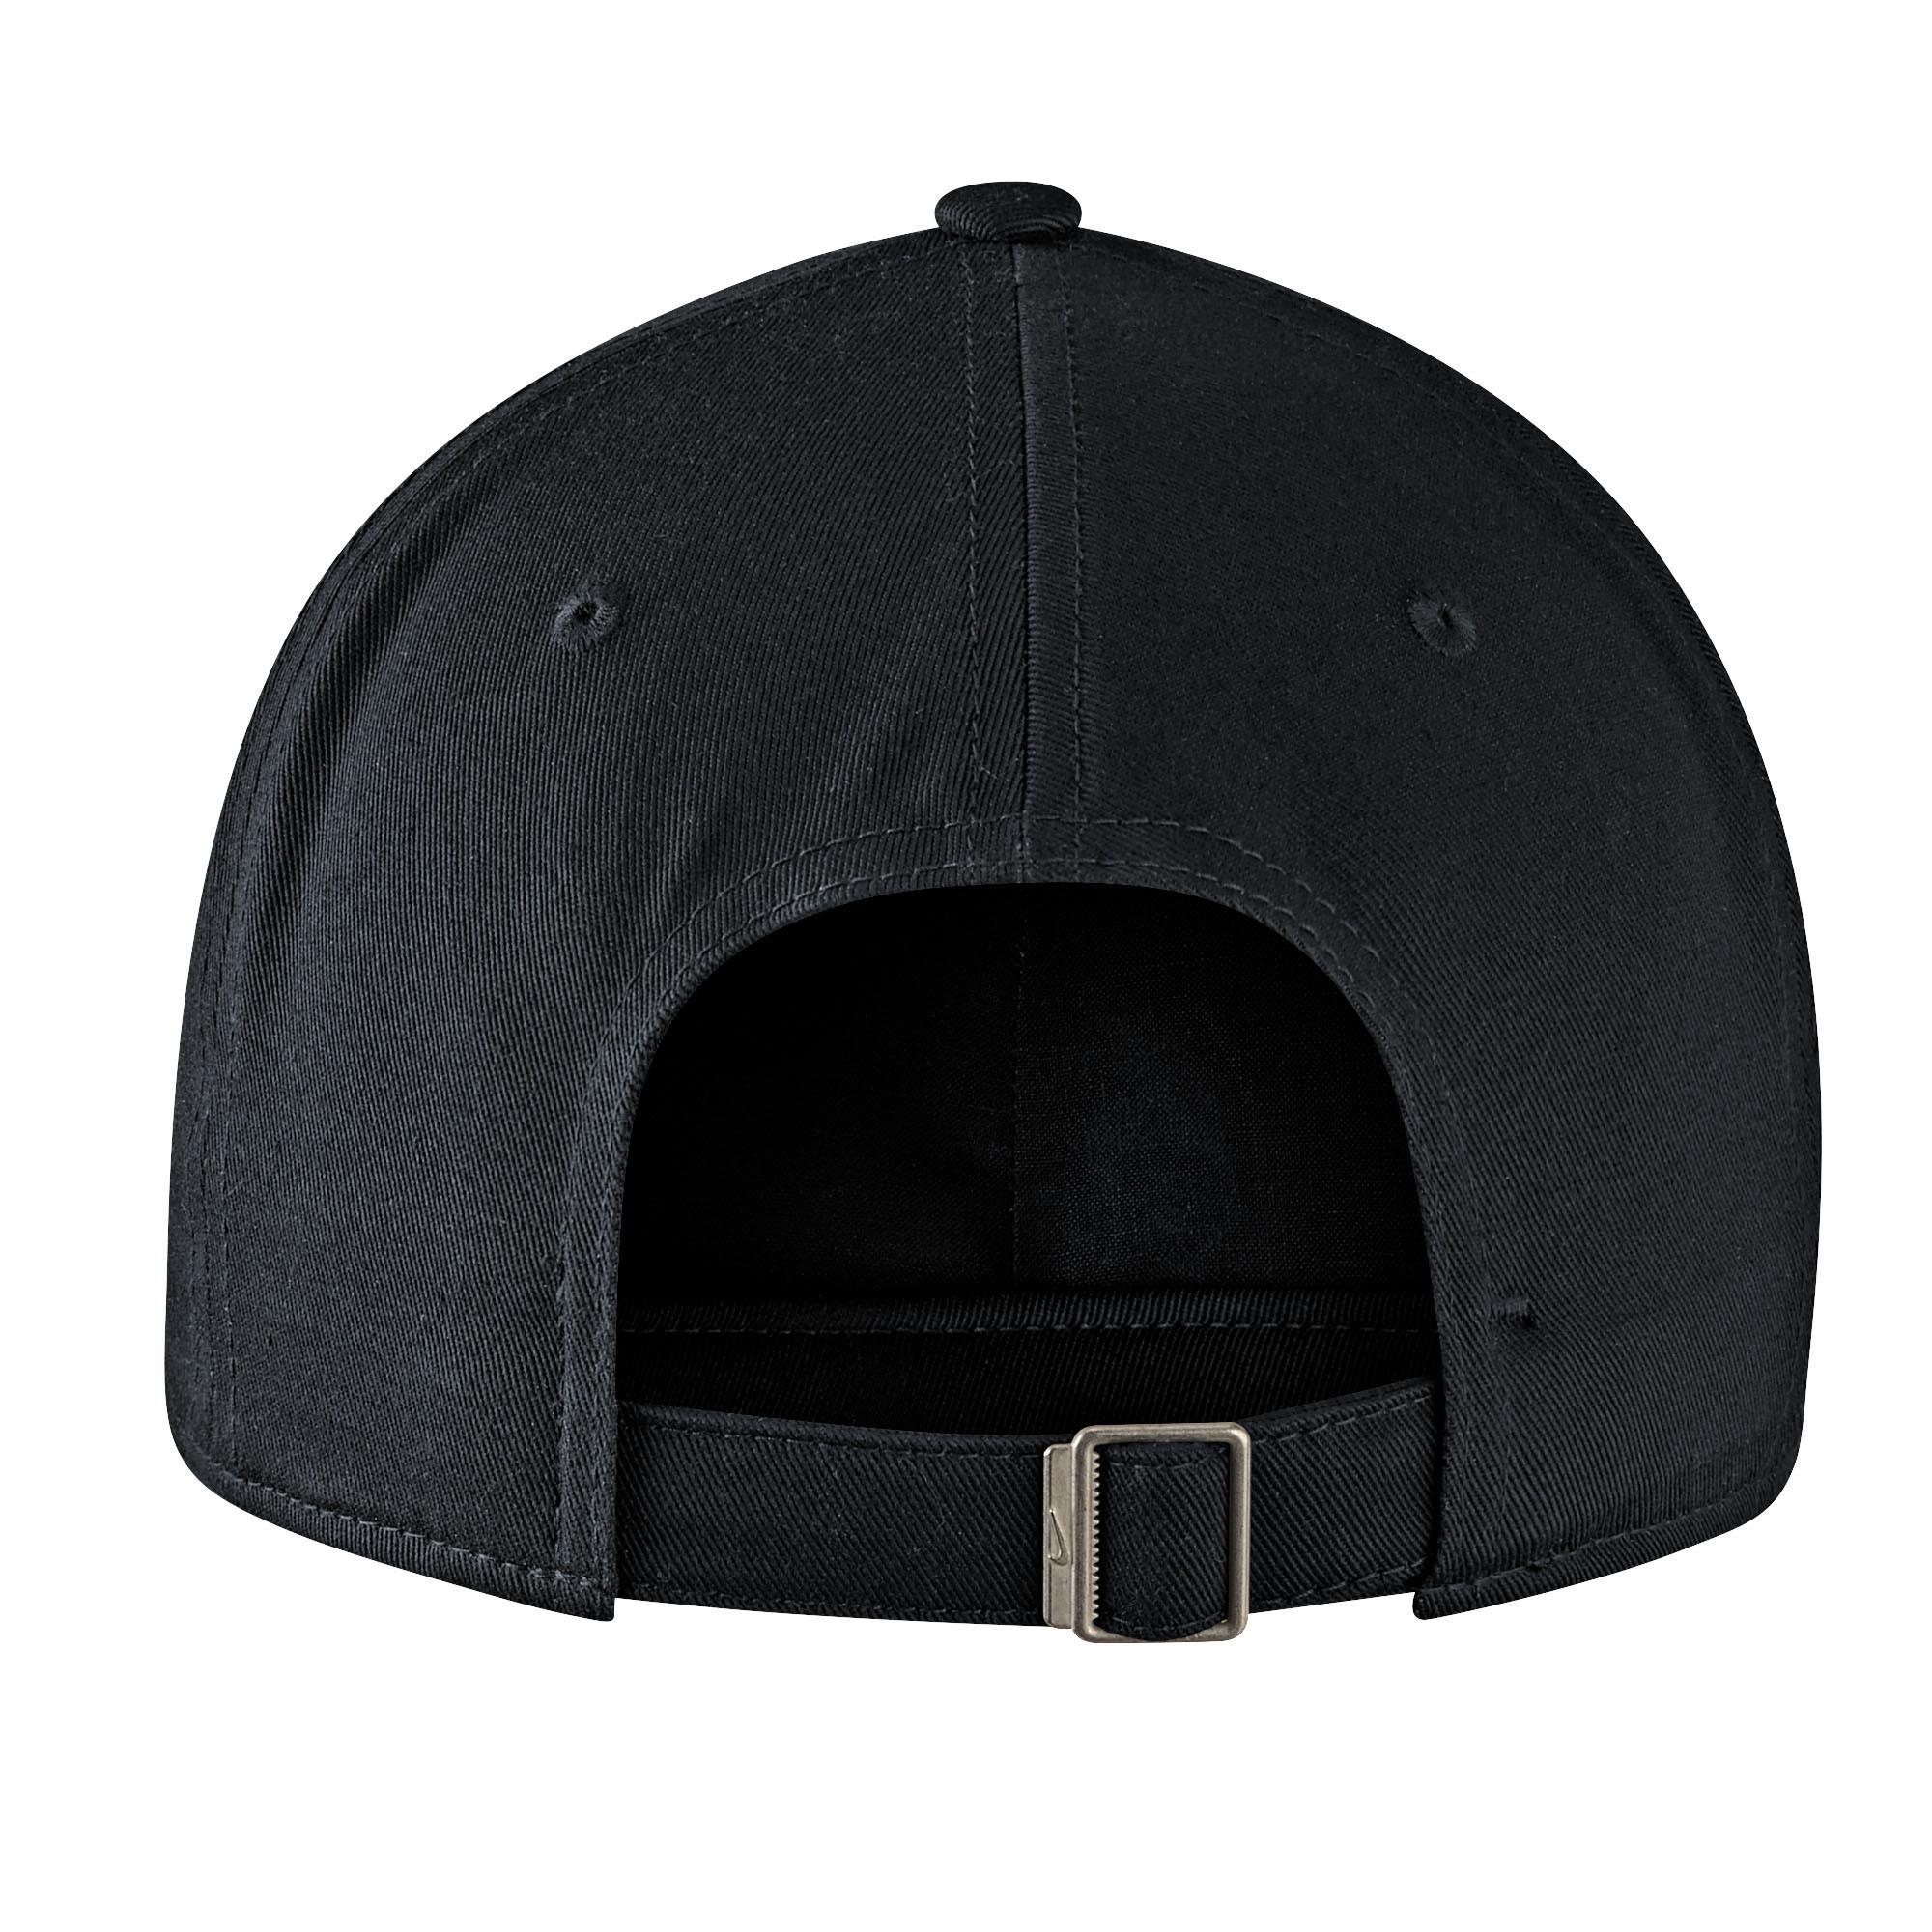 Nike Hat: Nike Campus Cap